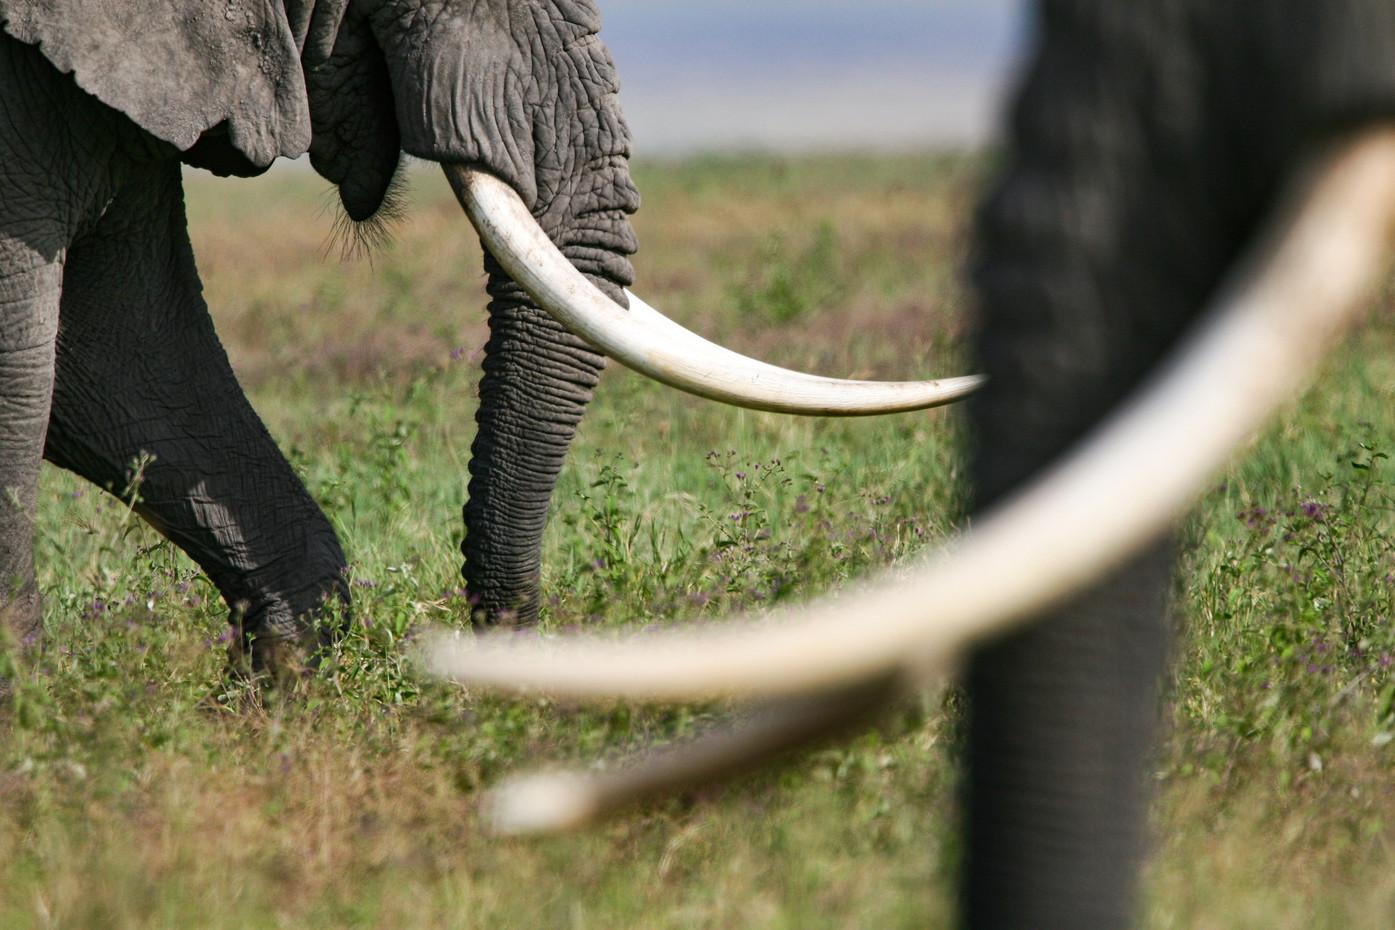 Bull elephants in the Ngorongoro Crater, Tanzania